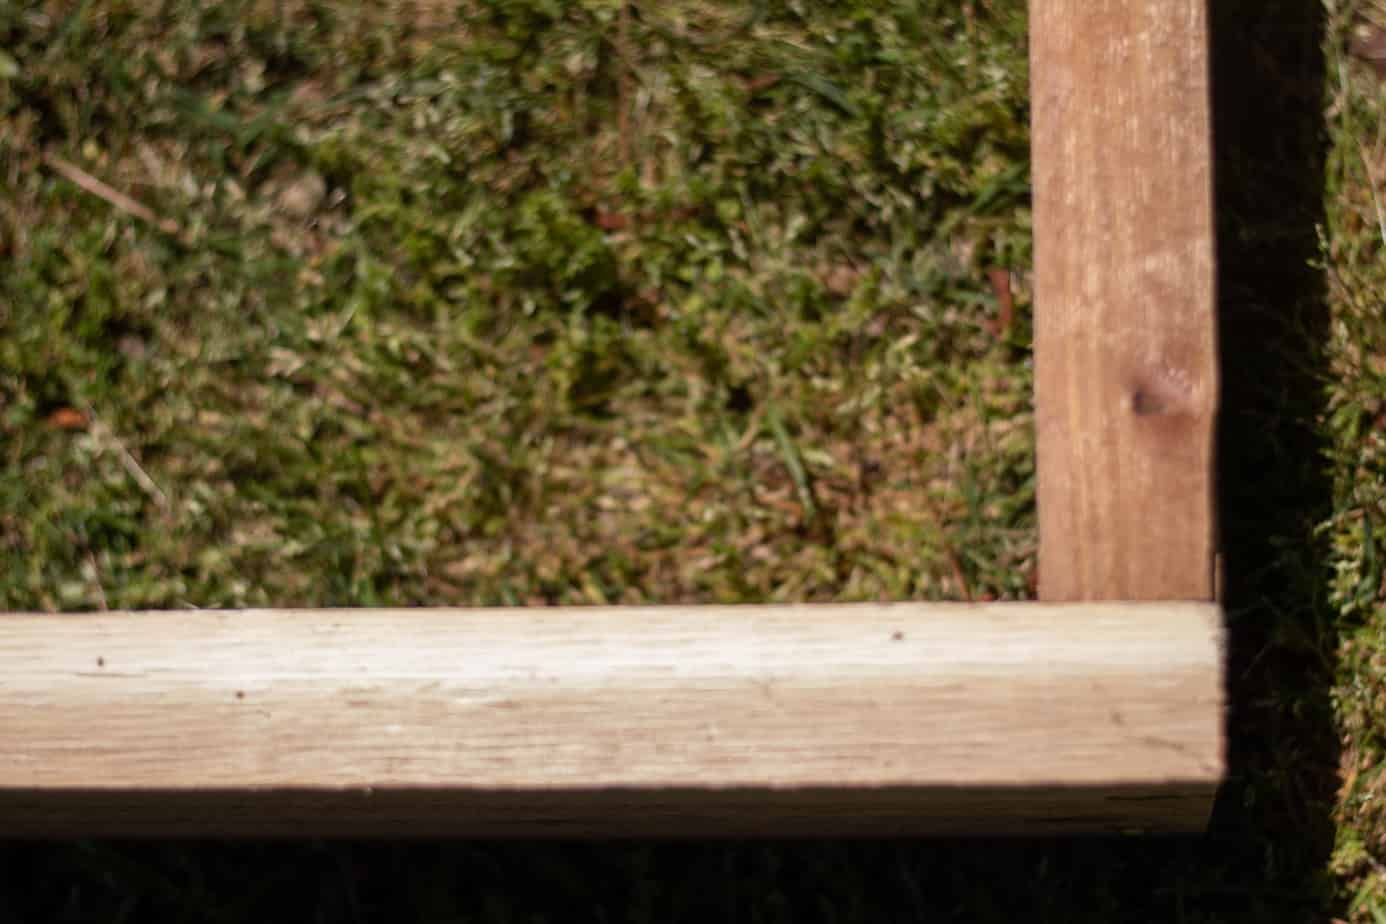 corner of a cedar raised garden bed sitting in the green grass